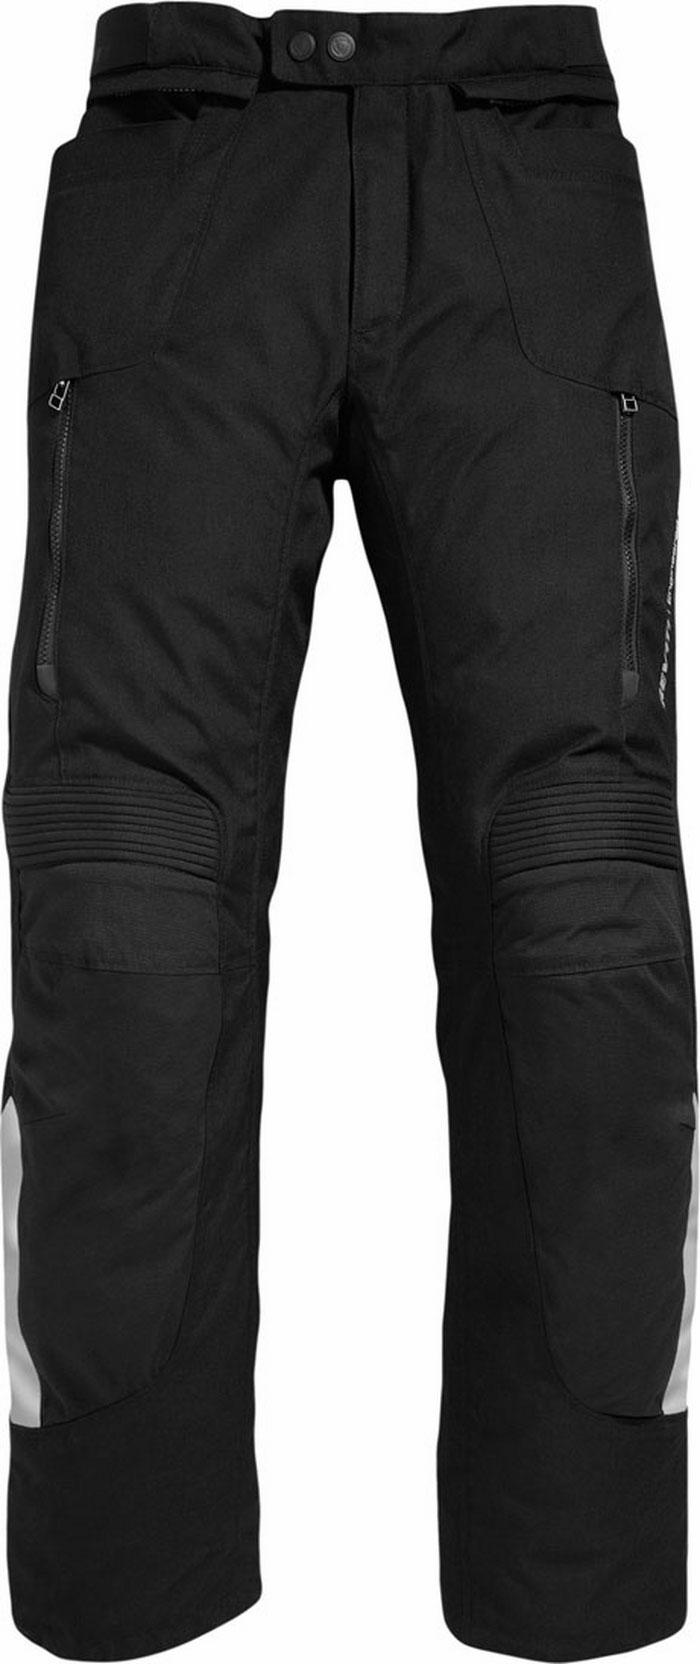 Pantaloni moto donna Rev'it Ventura neri